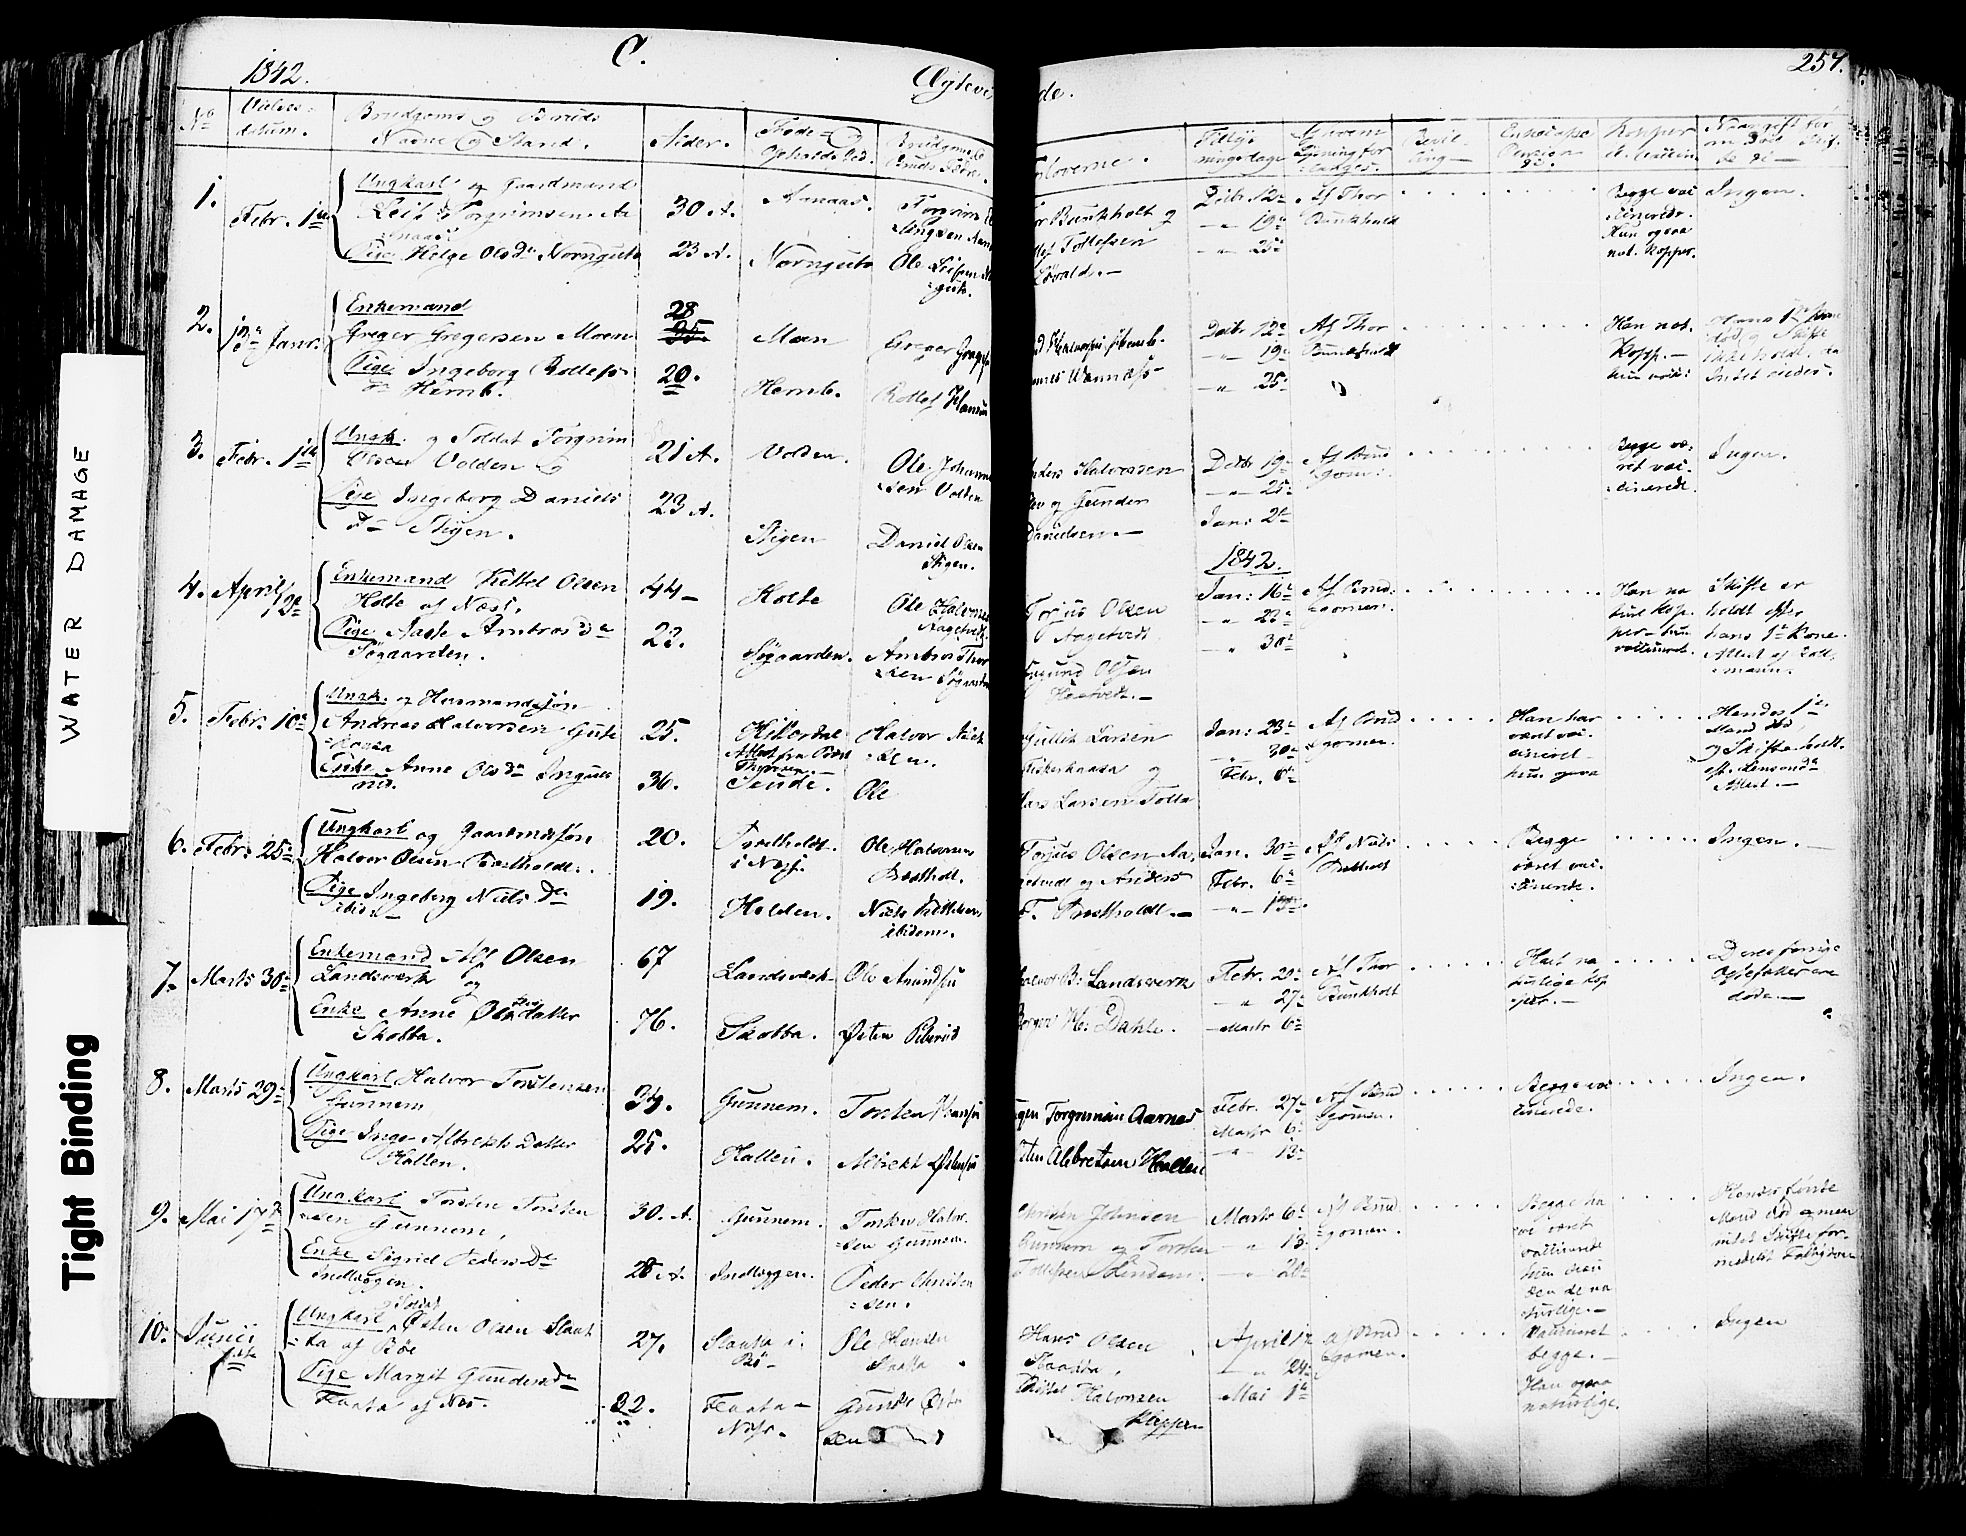 SAKO, Sauherad kirkebøker, F/Fa/L0006: Ministerialbok nr. I 6, 1827-1850, s. 257